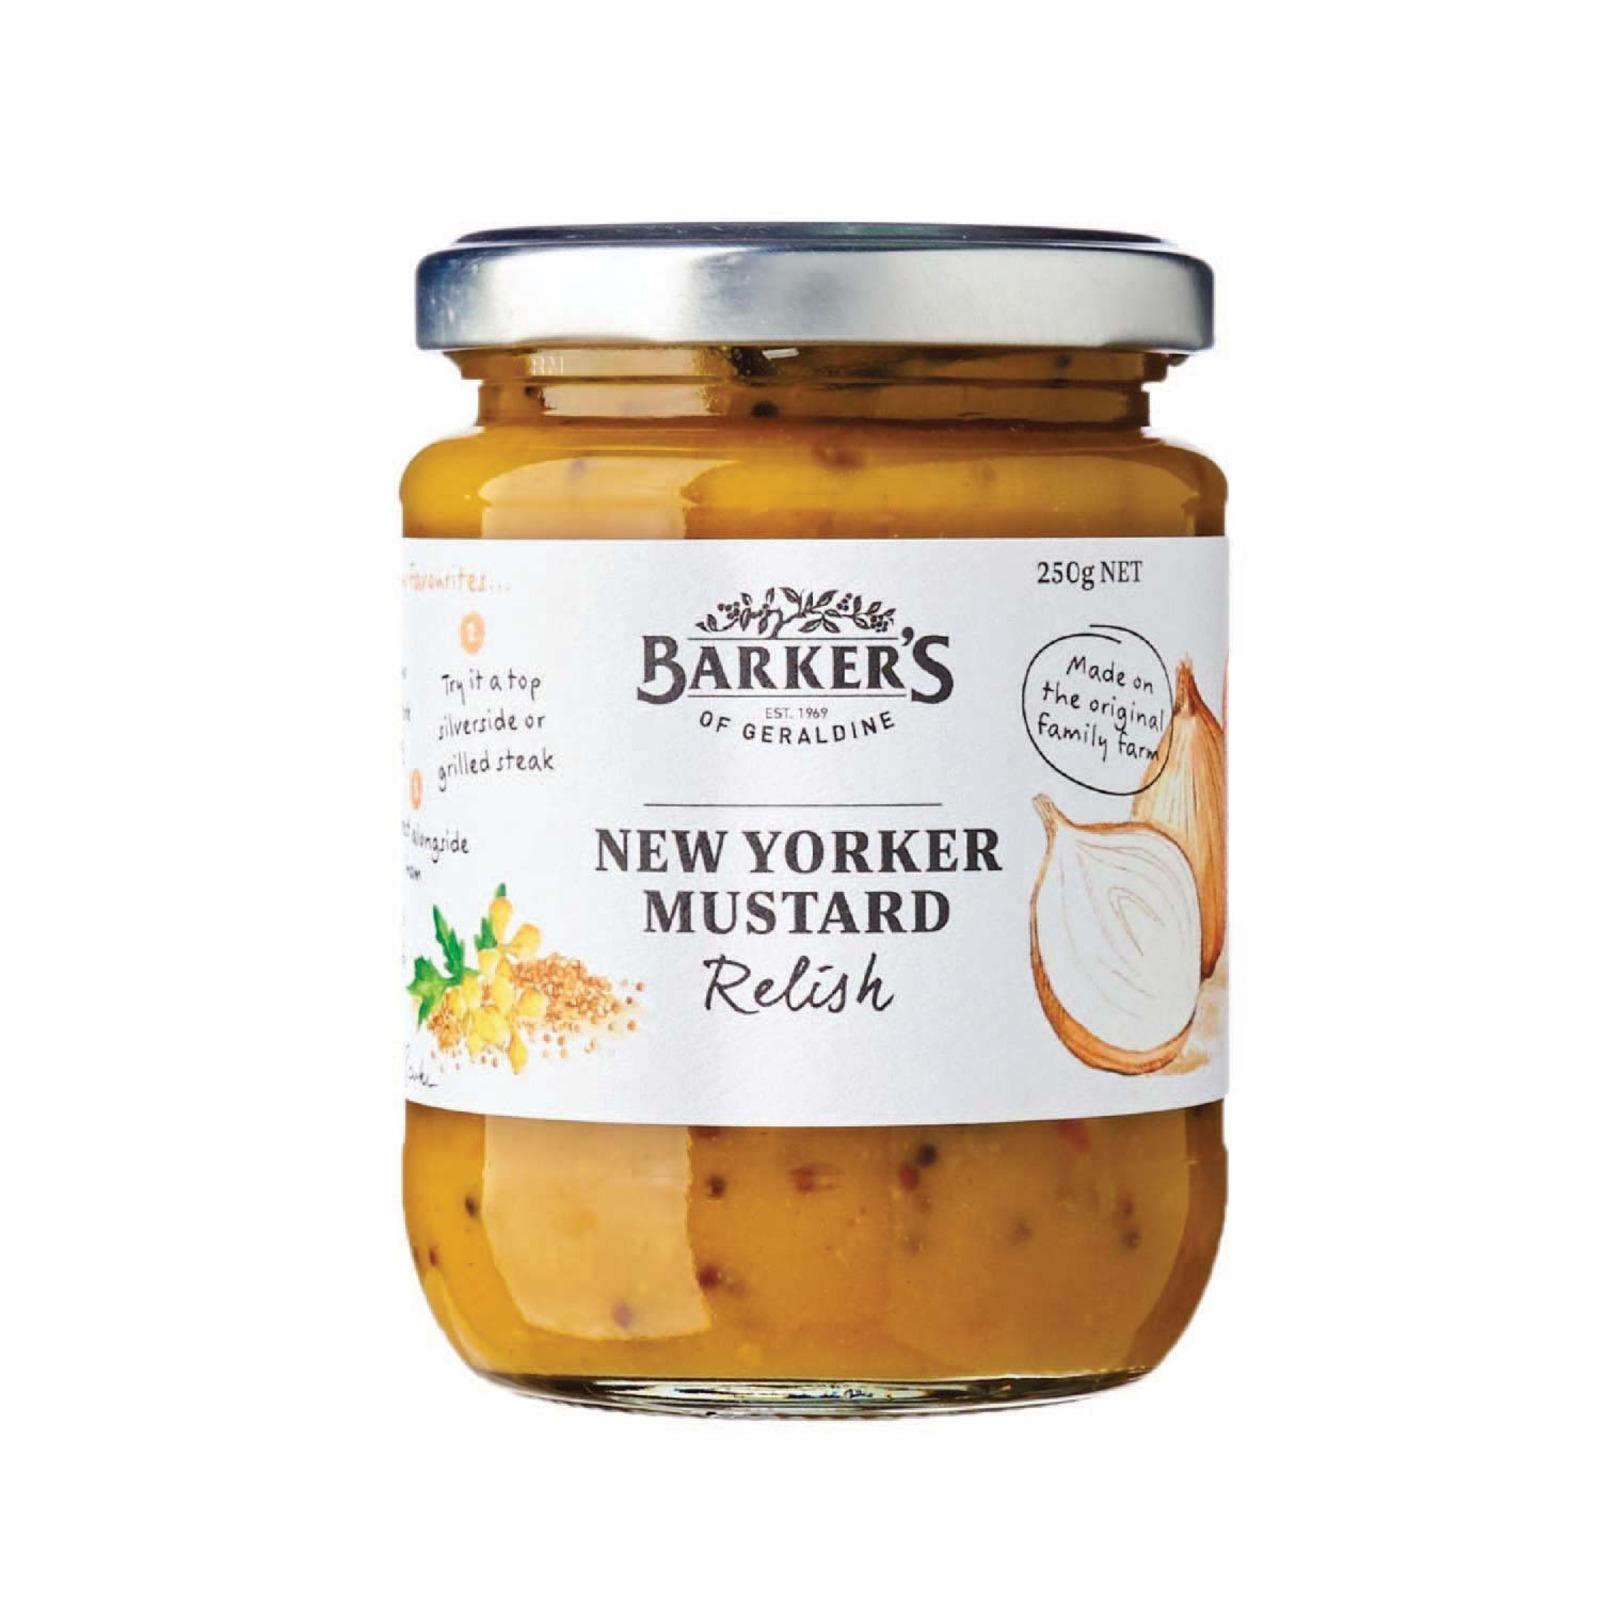 Baker's Of Geraldine New Yorker Mustard Relish